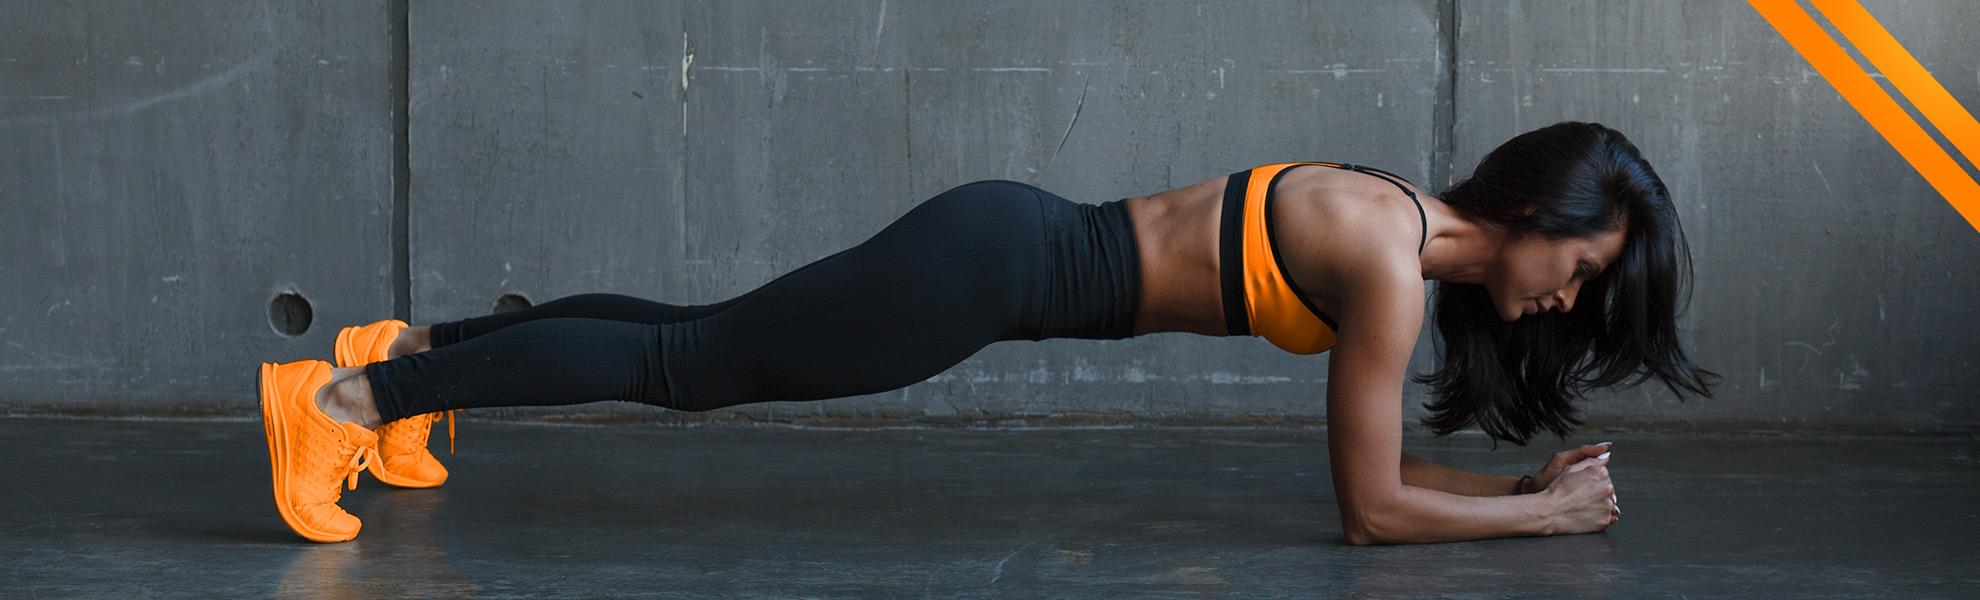 Personal Training Plank